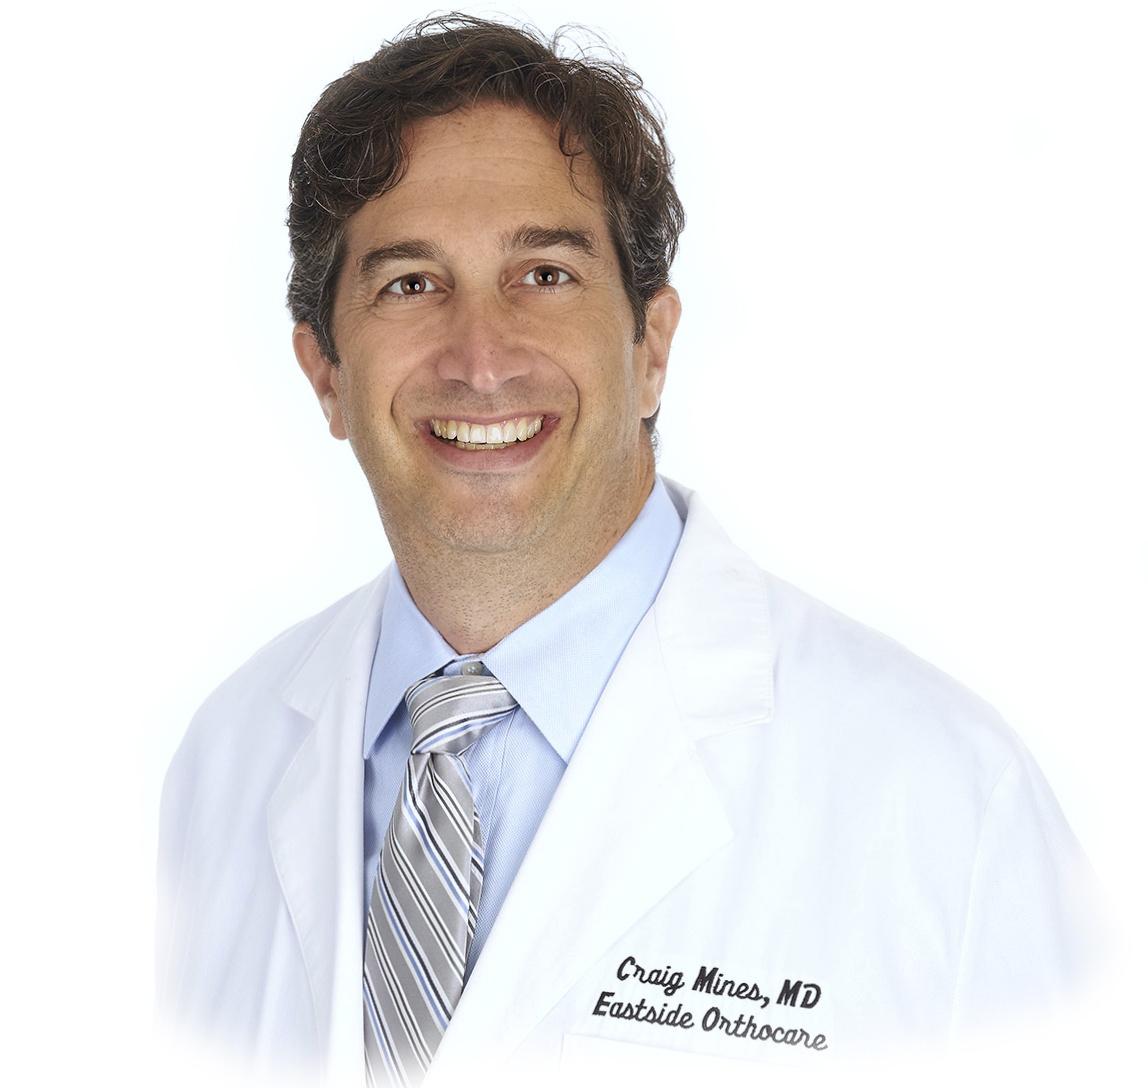 Dr. Craig Mines